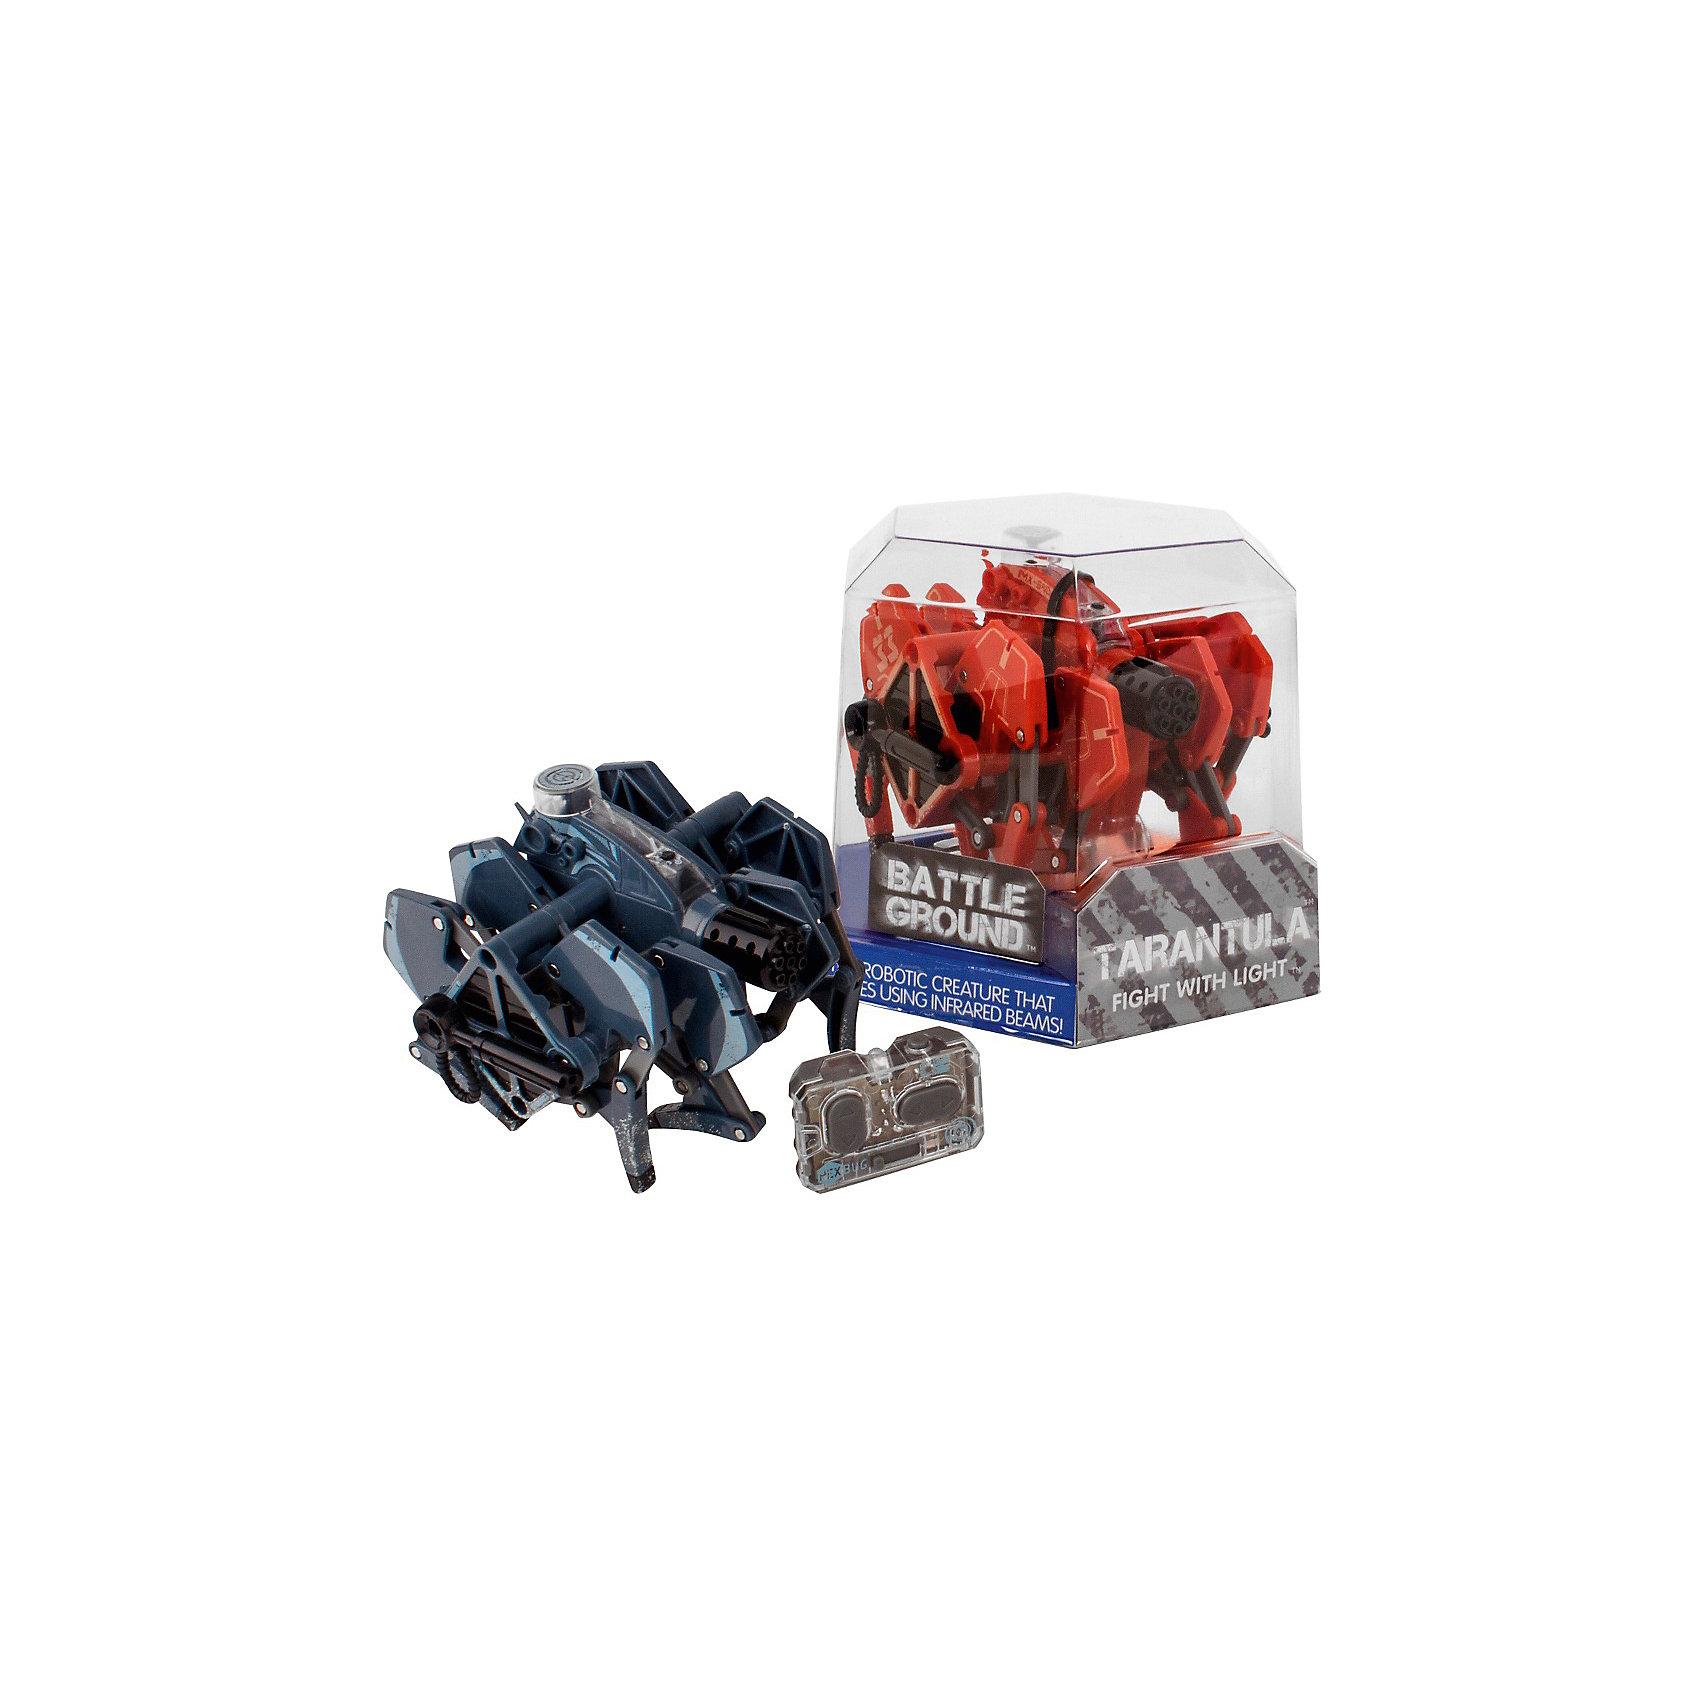 Микро-робот Battle Tarantula, Hexbug<br><br>Ширина мм: 160<br>Глубина мм: 80<br>Высота мм: 120<br>Вес г: 230<br>Возраст от месяцев: 36<br>Возраст до месяцев: 2147483647<br>Пол: Унисекс<br>Возраст: Детский<br>SKU: 5507191